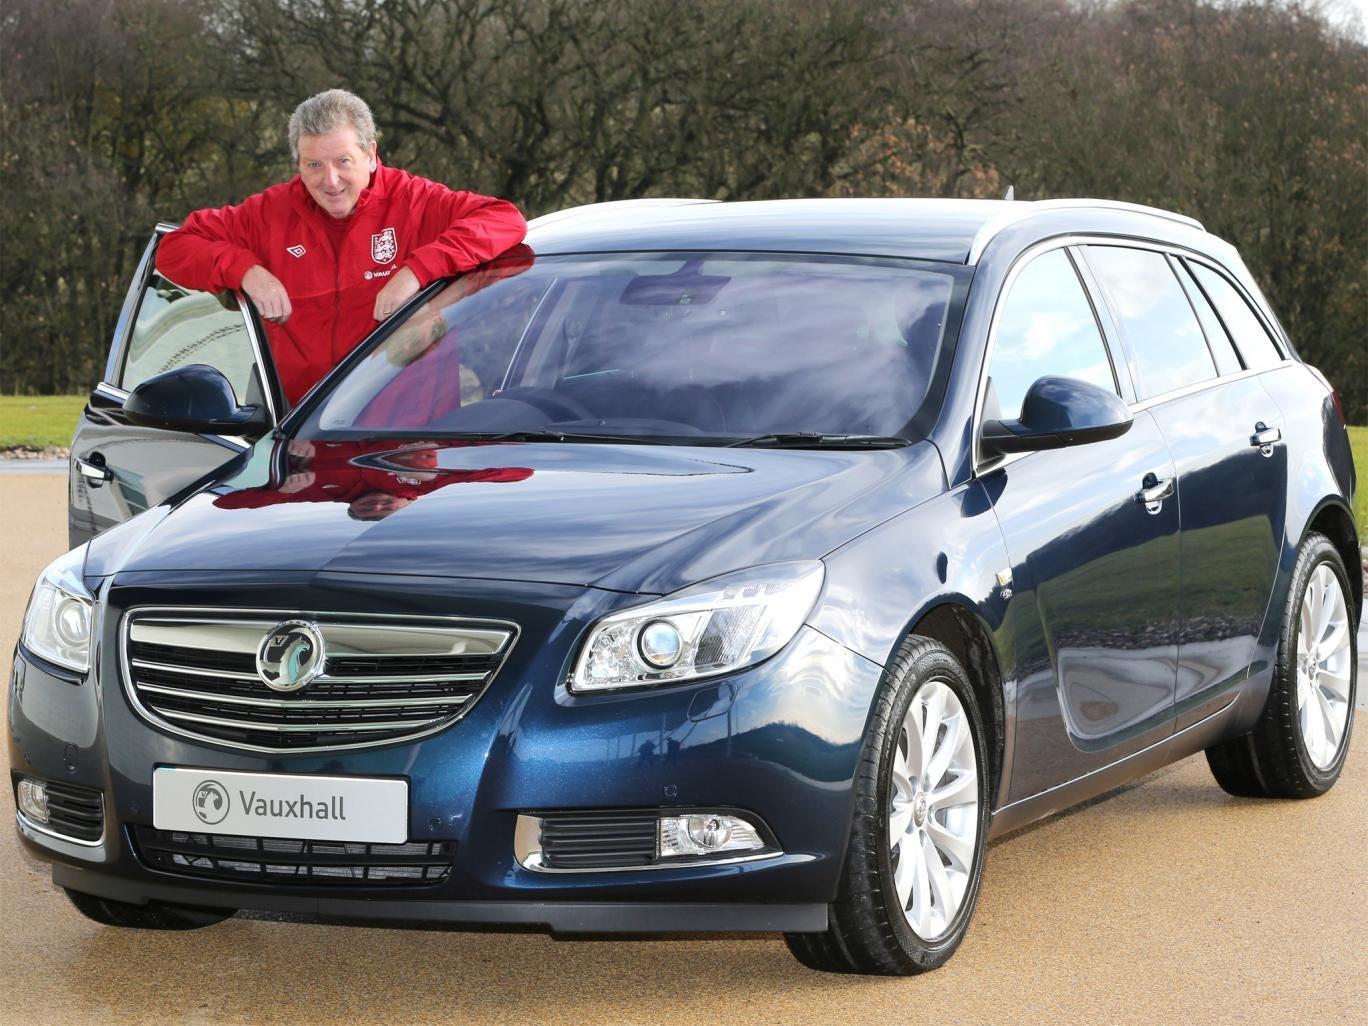 Sensible choice: Roy Hodgson and his shiny new Vauxhall Insignia